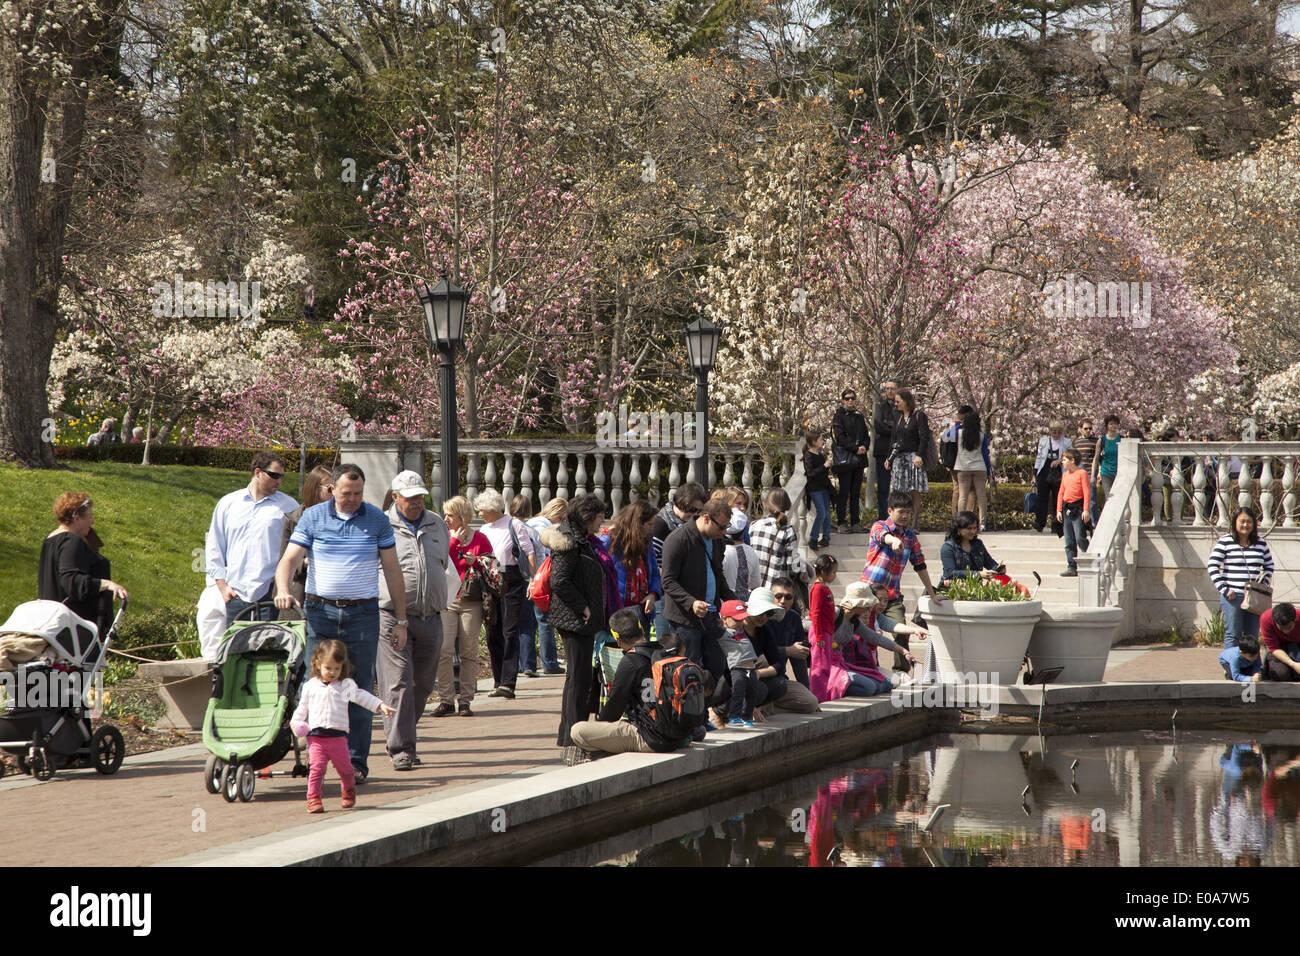 People Enjoy A Beautiful Spring Day In Magnolia Plaza At The Brooklyn  Botanic Garden, Brooklyn, NY